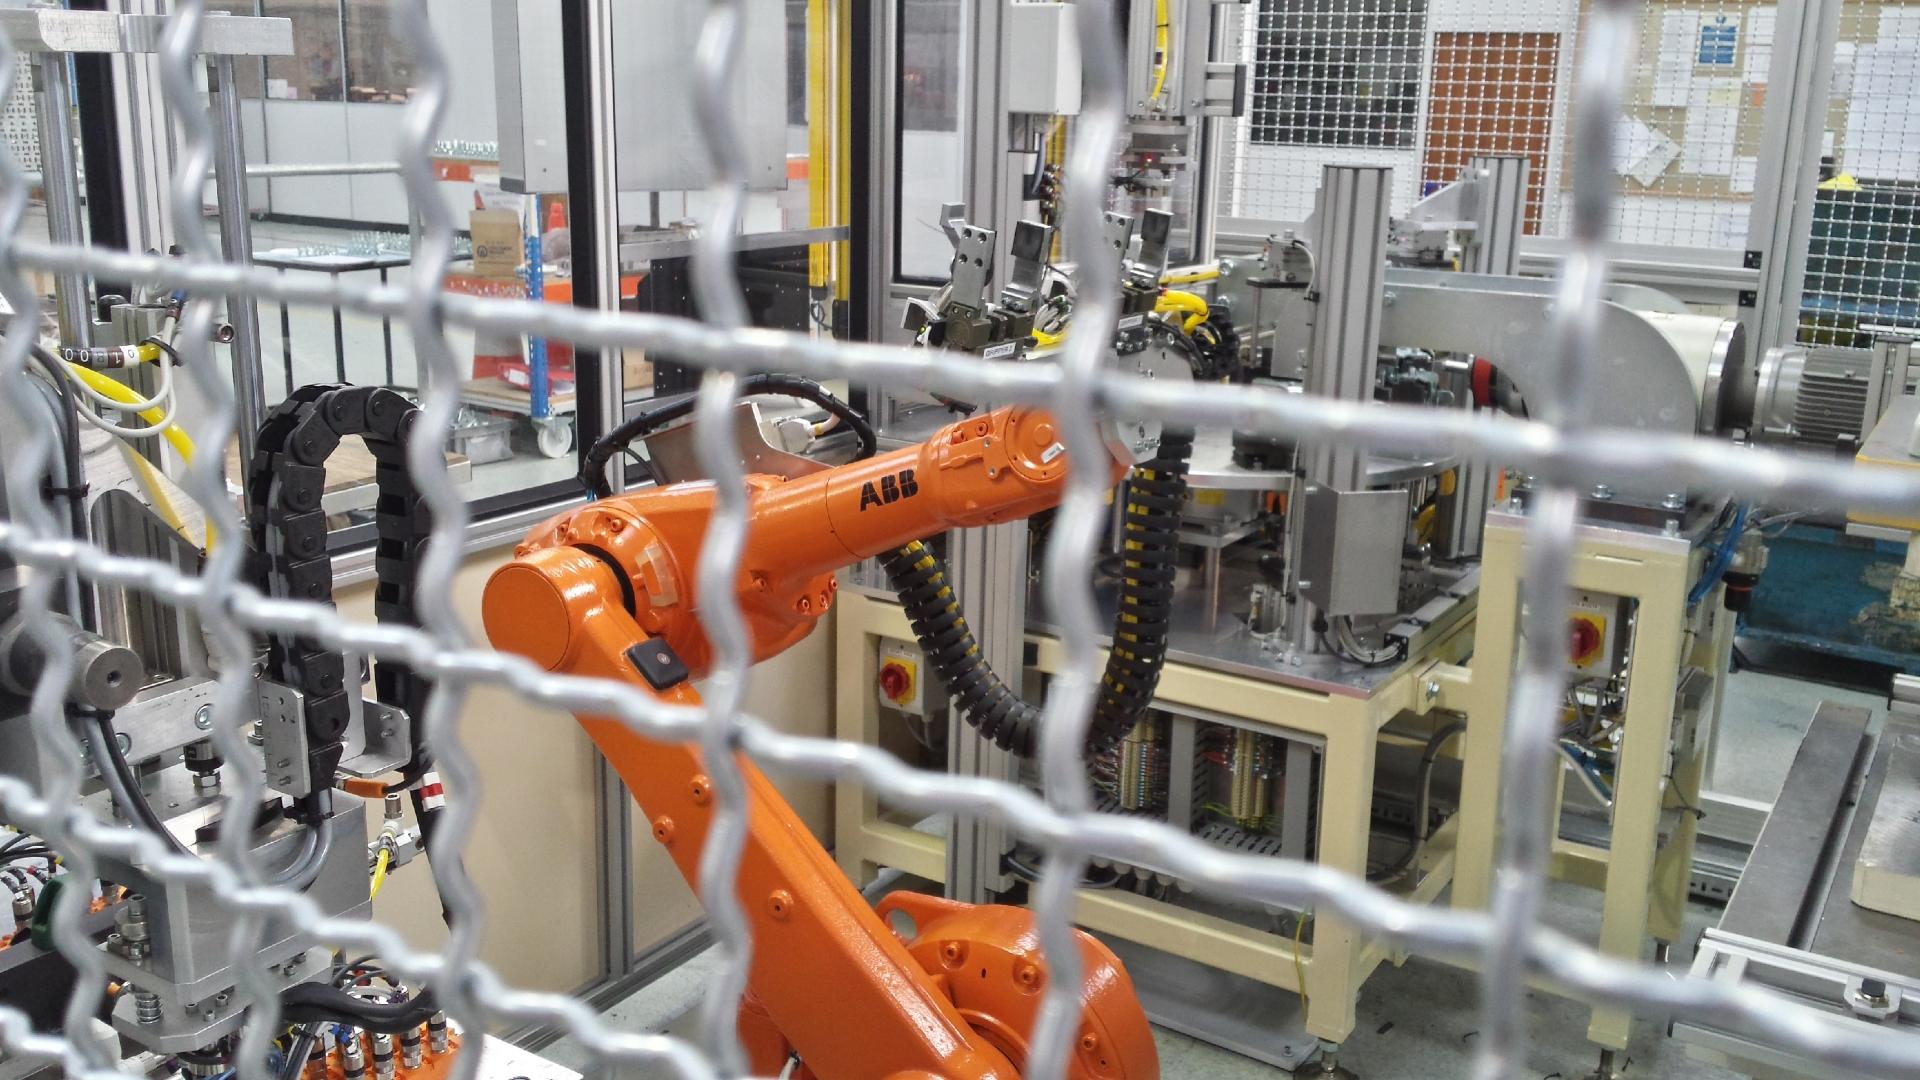 abb-robot-automation